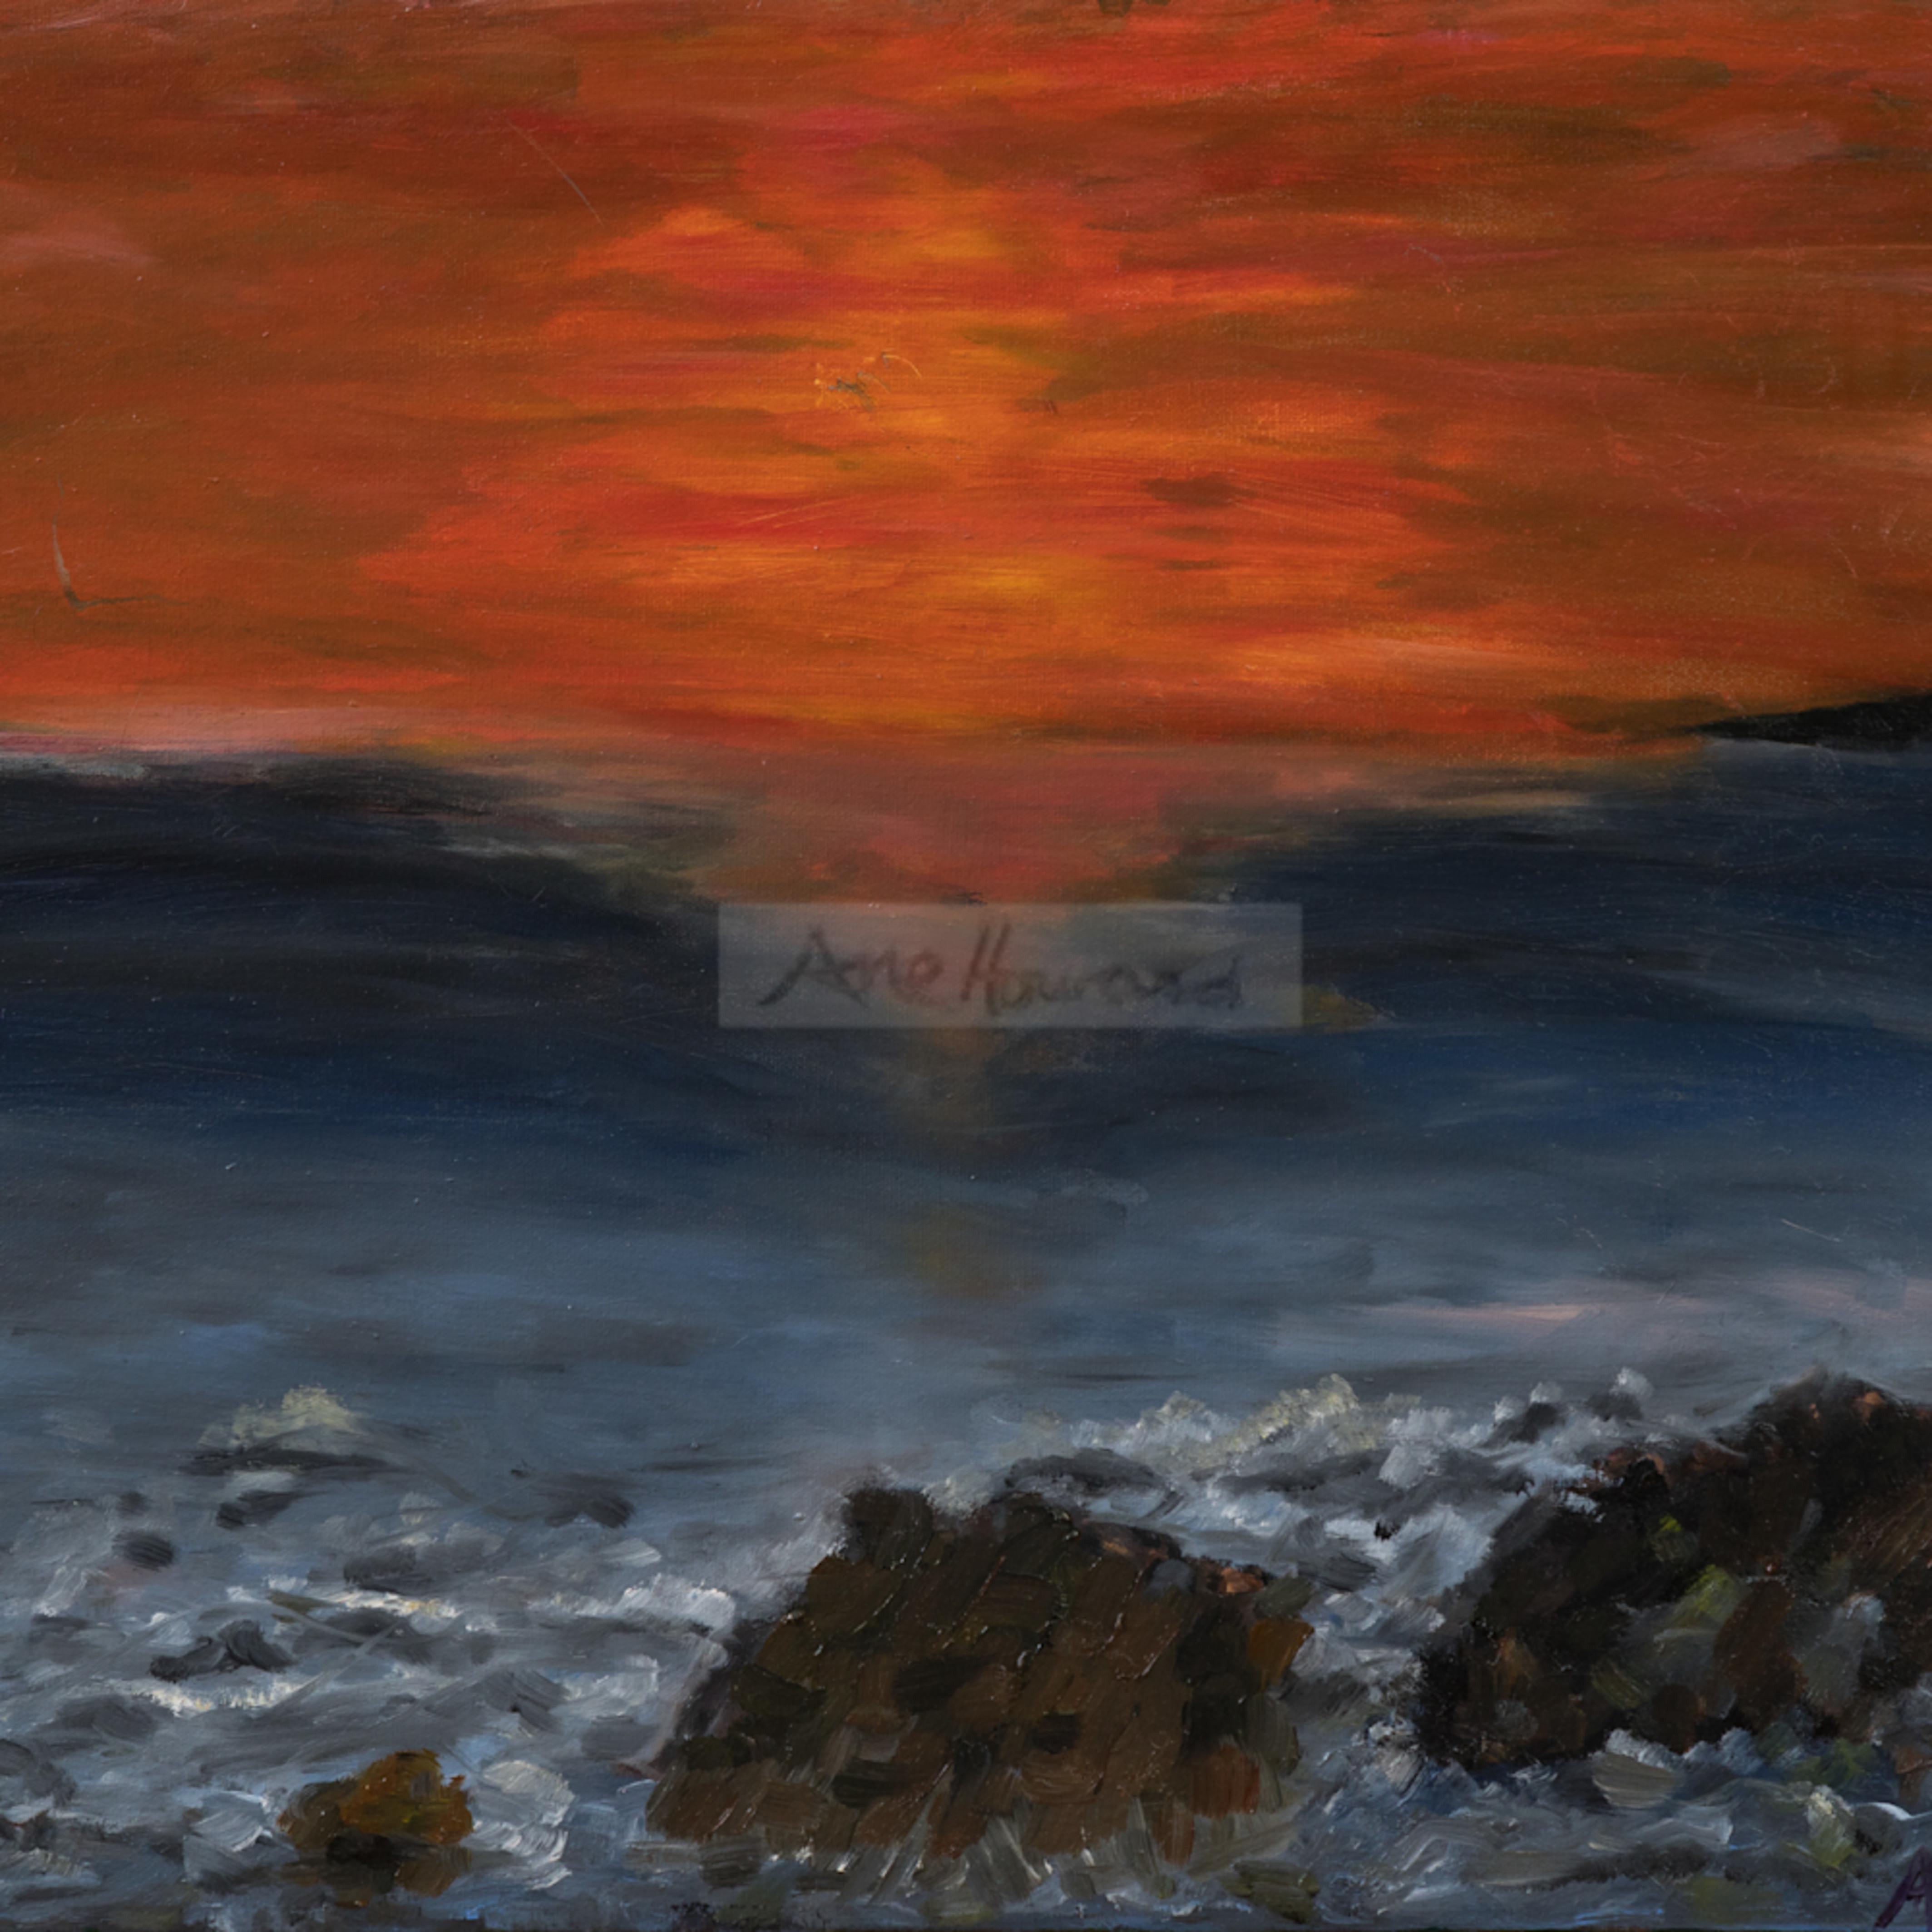 Sunset in santa cruz hkmqiy